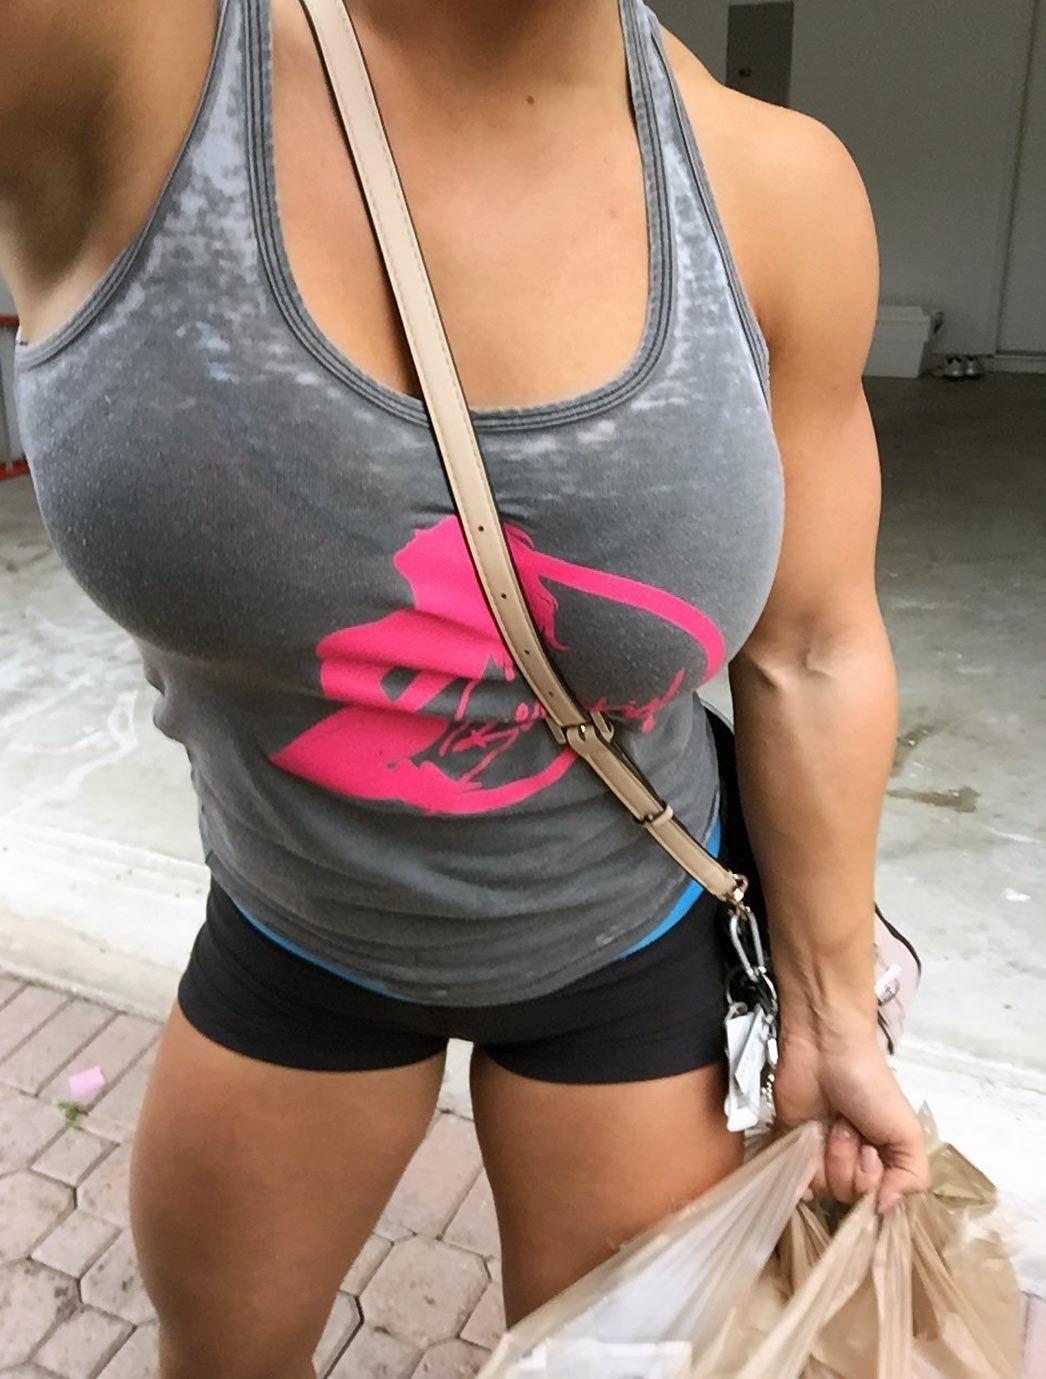 Celeste Bonin Nude Leaked The Fappening & Sexy 0216